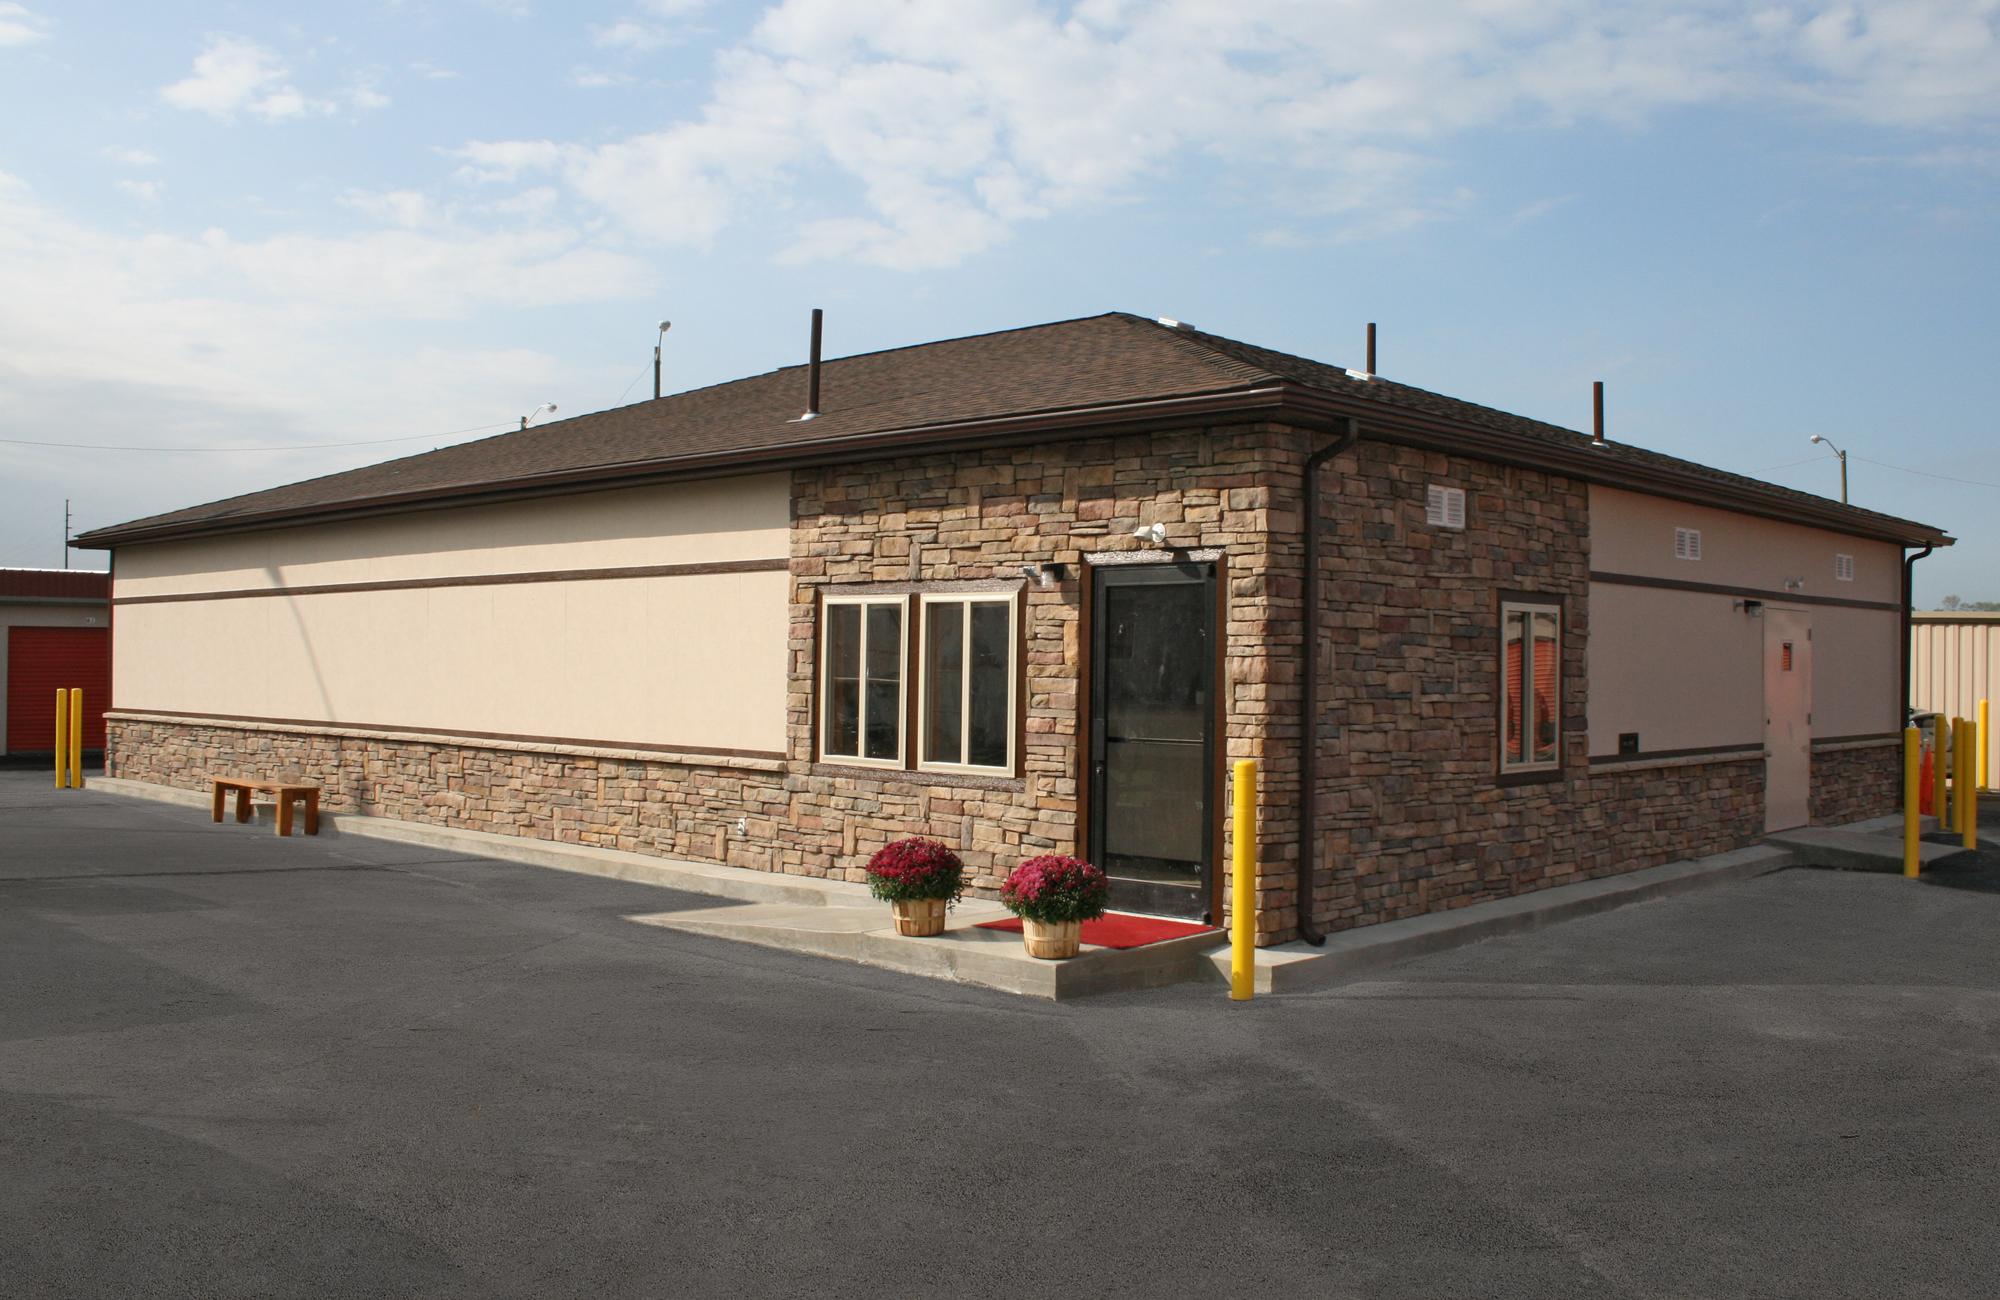 Exterior-Roof-Hip-Photo